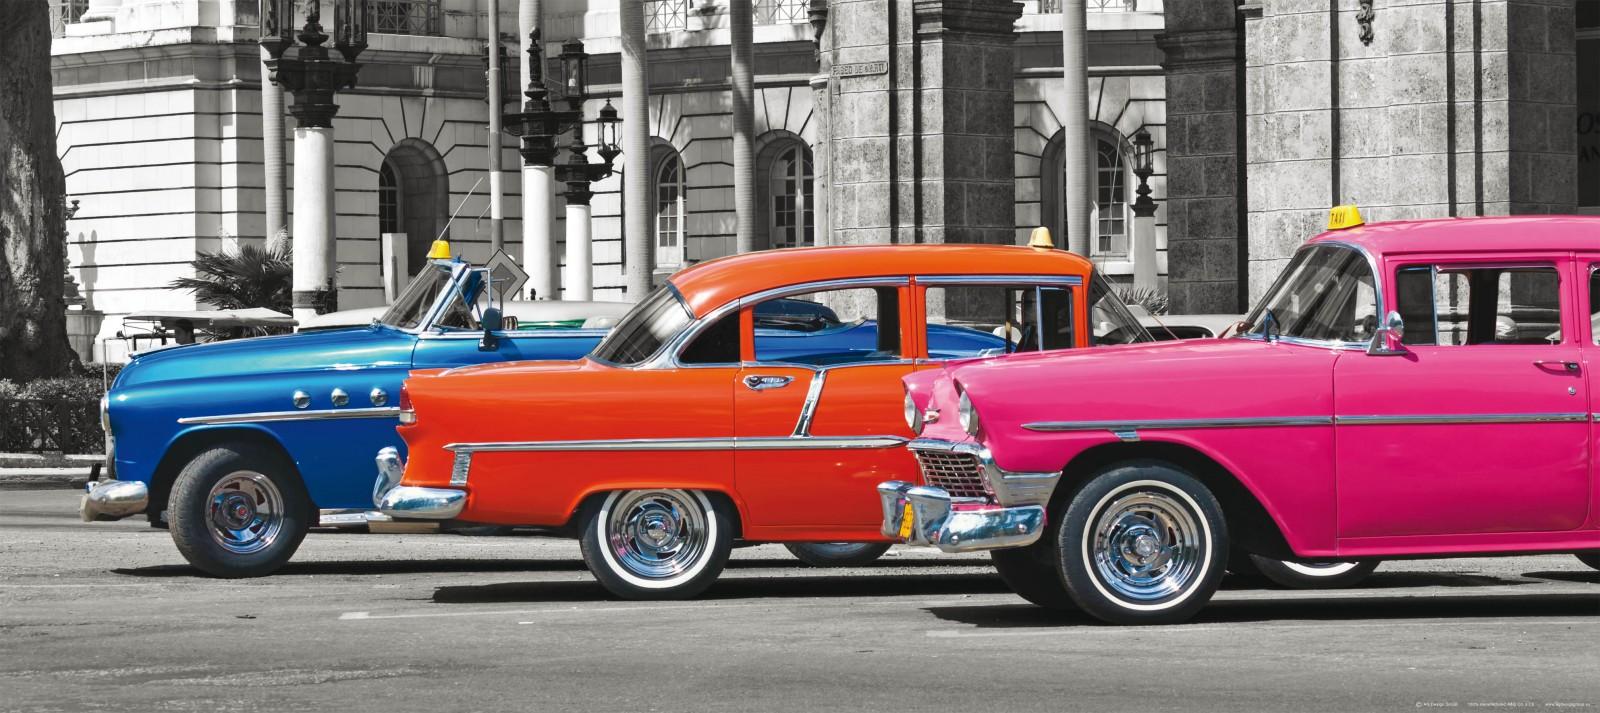 fototapete tapete autos oldtimer blau orange pink foto 90. Black Bedroom Furniture Sets. Home Design Ideas